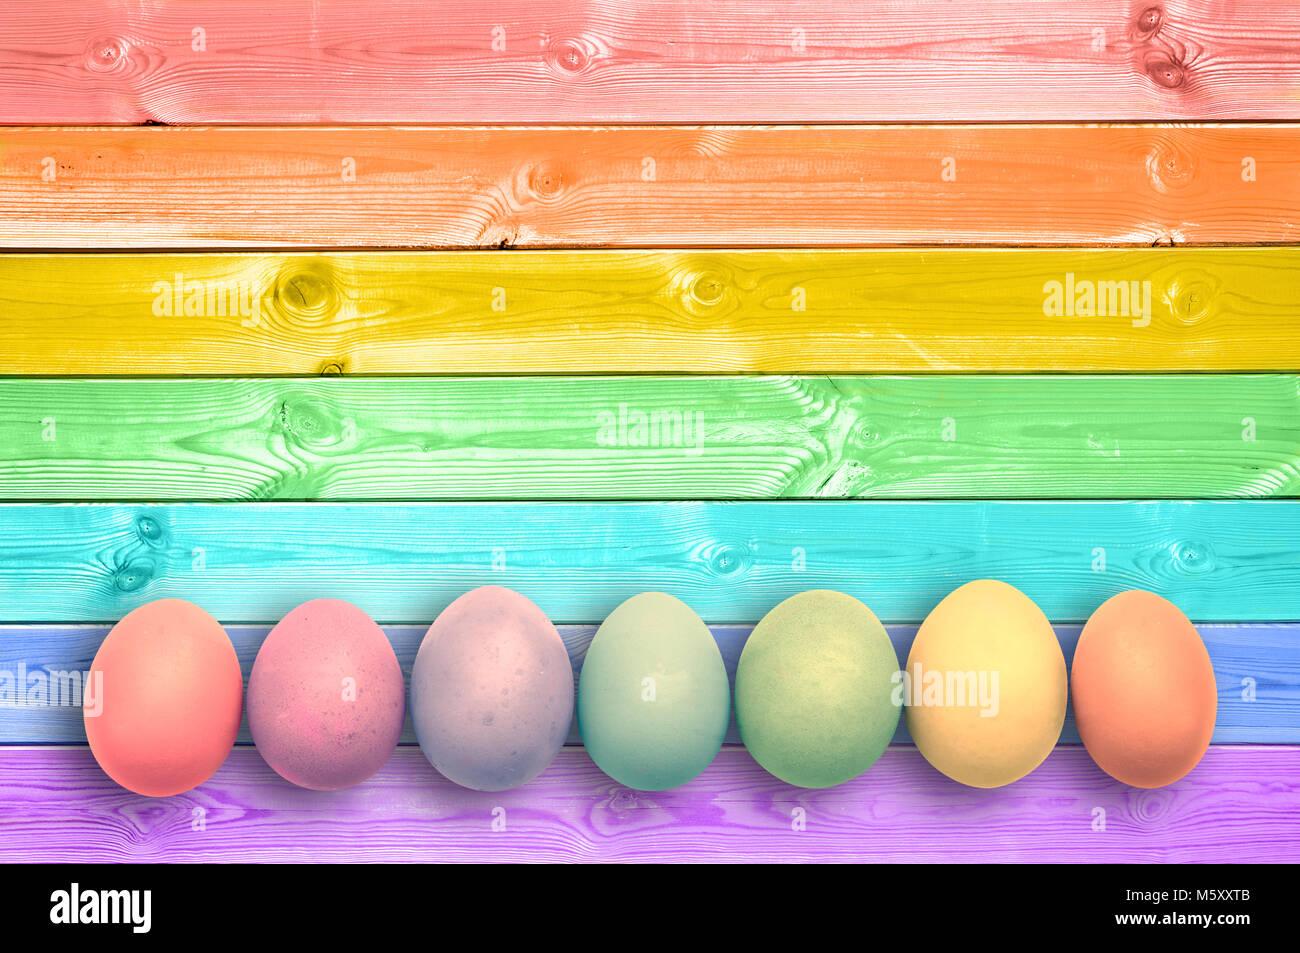 Pastel colorful rainbow painted wood planks background - Stock Image